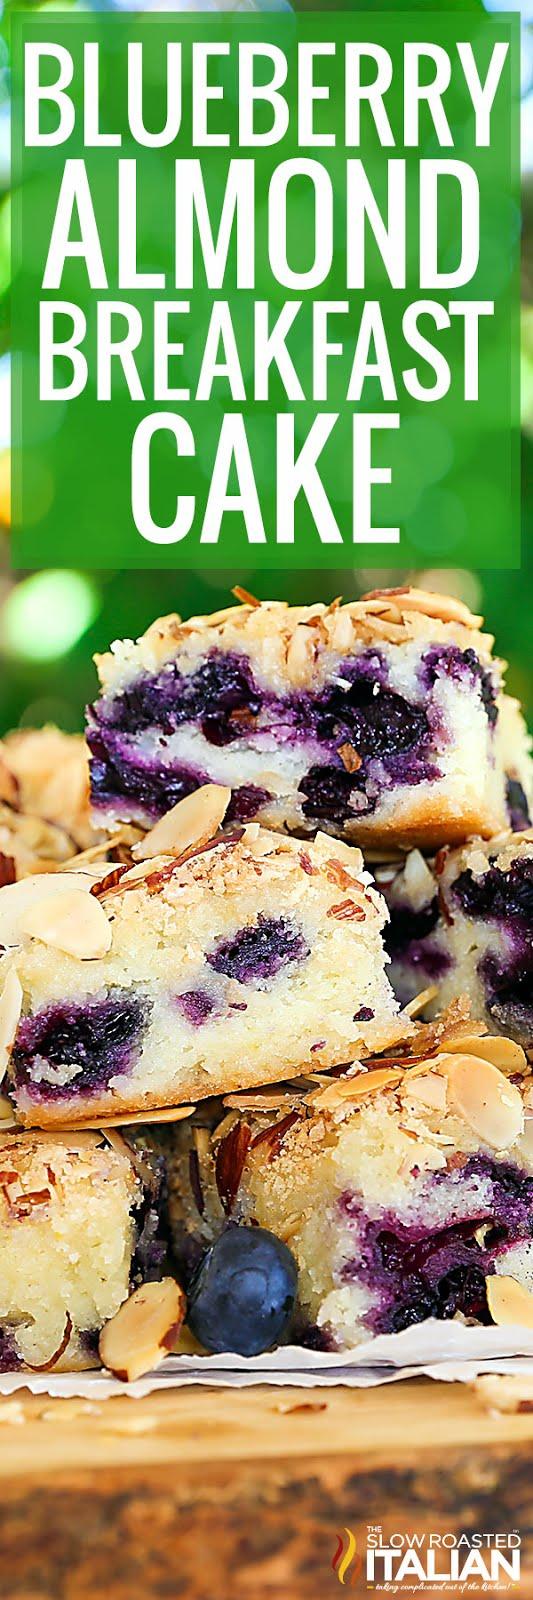 titled photo for Pinterest - Blueberry Almond Breakfast Cake